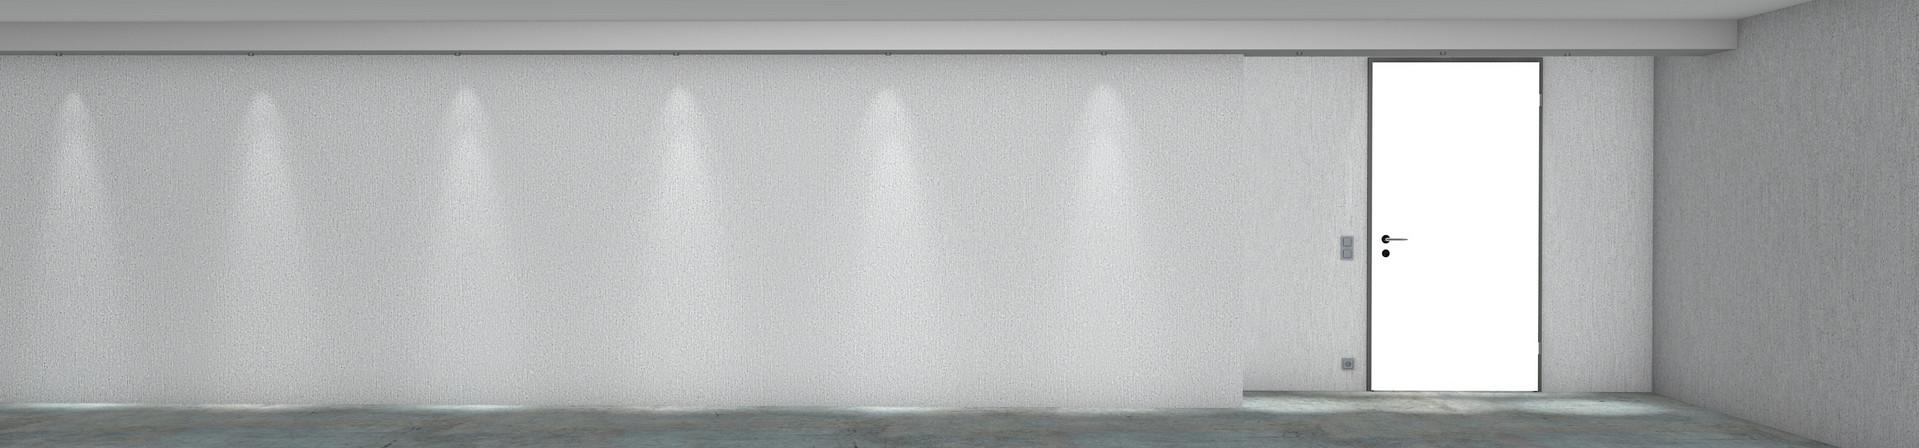 Türen & Stahlzargen für tolles Ambiente | BOS Best Of Steel